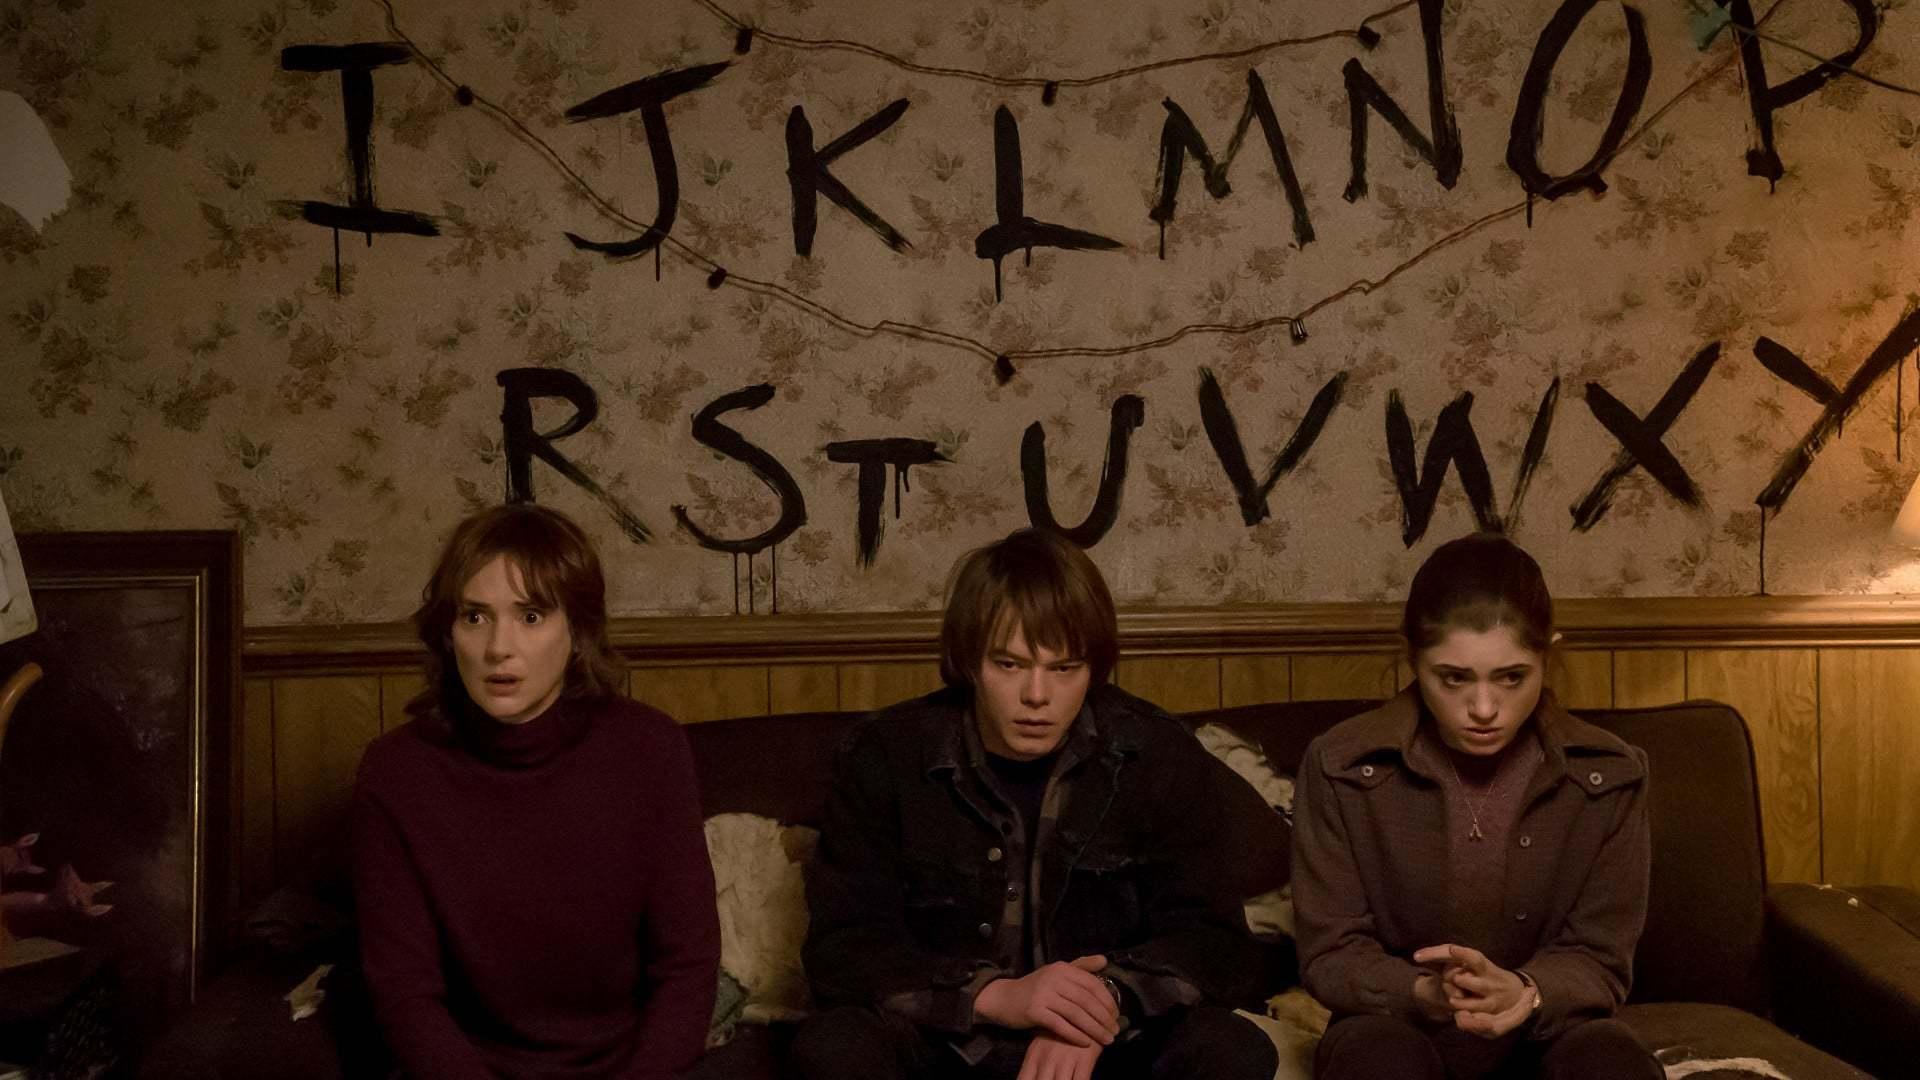 Кадры из фильма Очень странные дела Stranger Things 2016